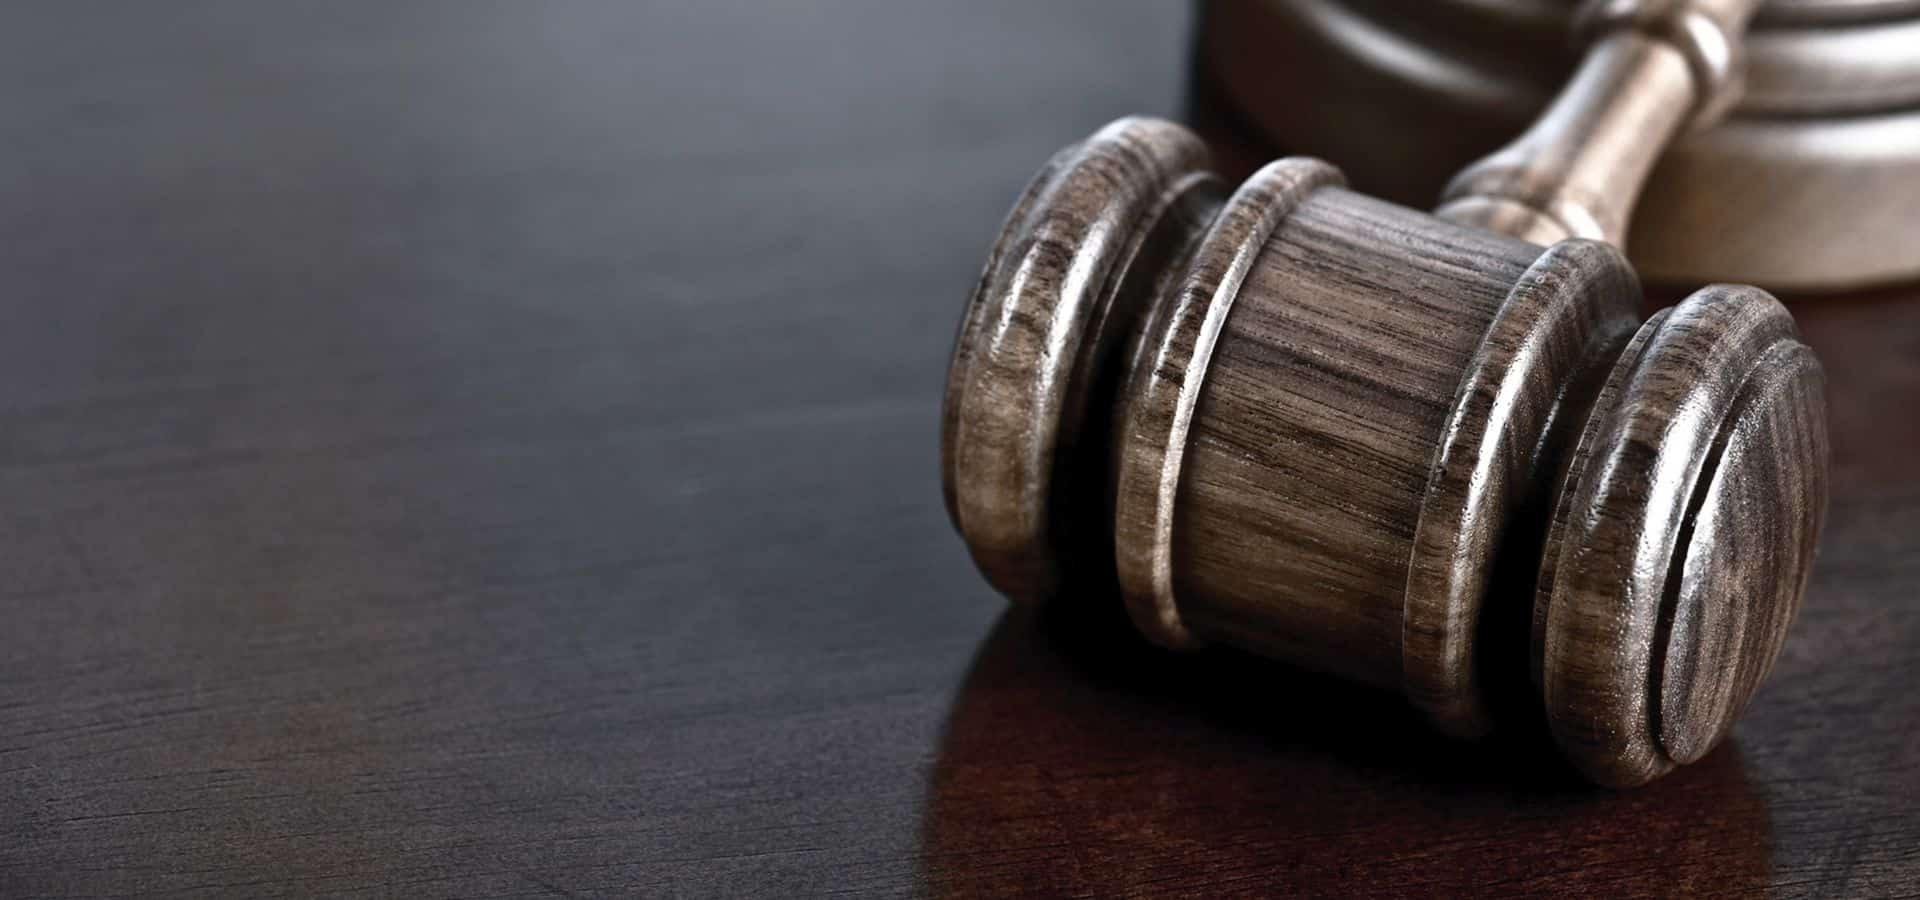 Turkish Litigation & Trial Lawyers English Speaking